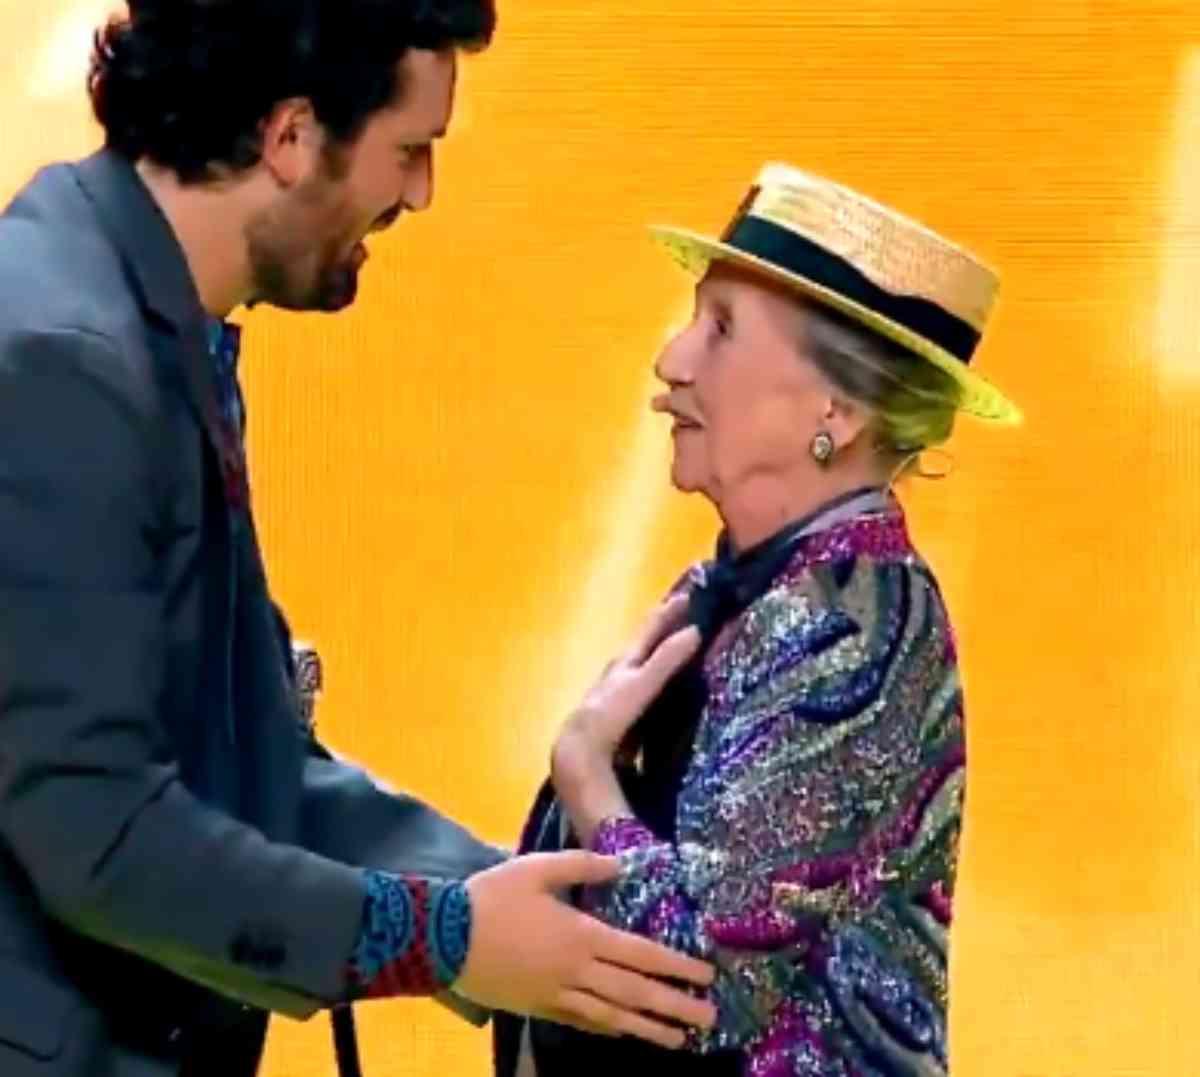 Frank Matano e Claudia Lawrence a Italia's got talent 2020